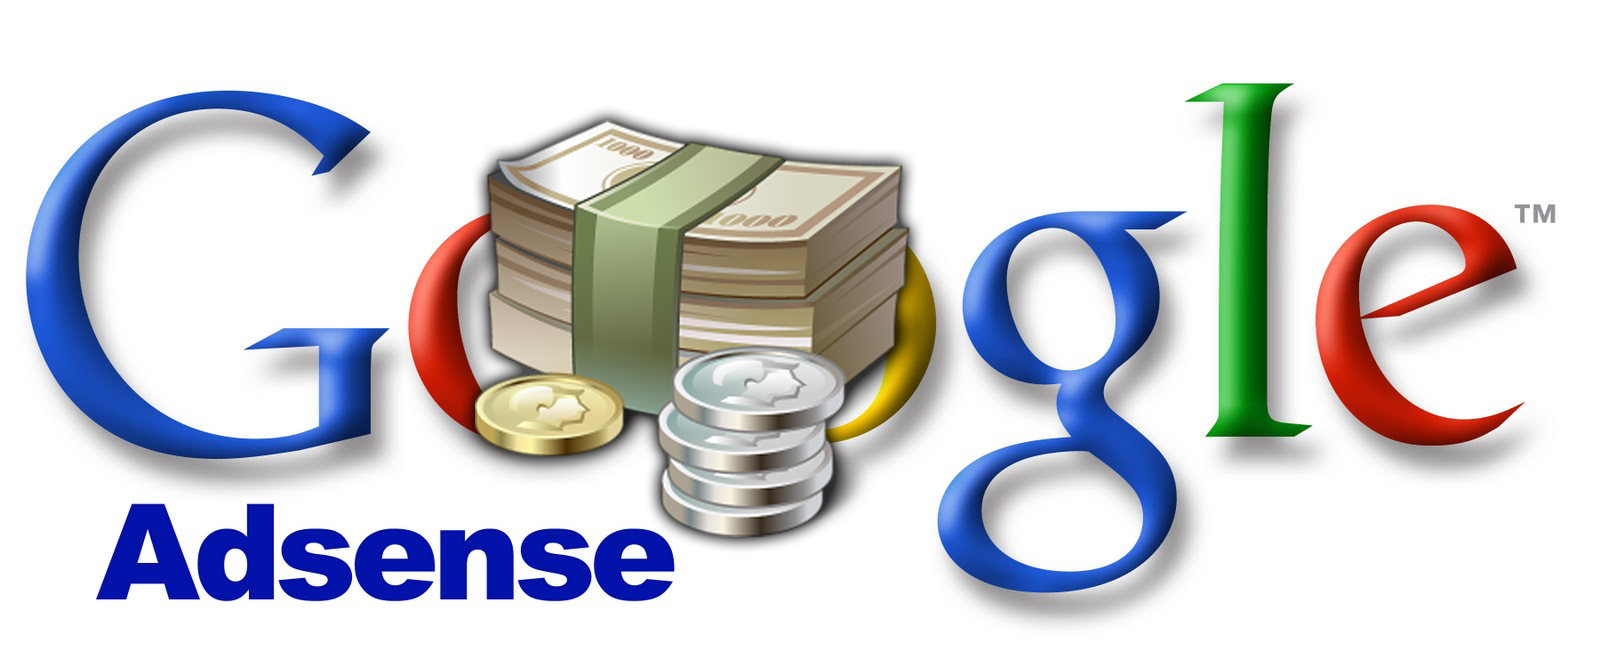 Cara Dapat Duit atau Penghasilan Dari Google Adsense